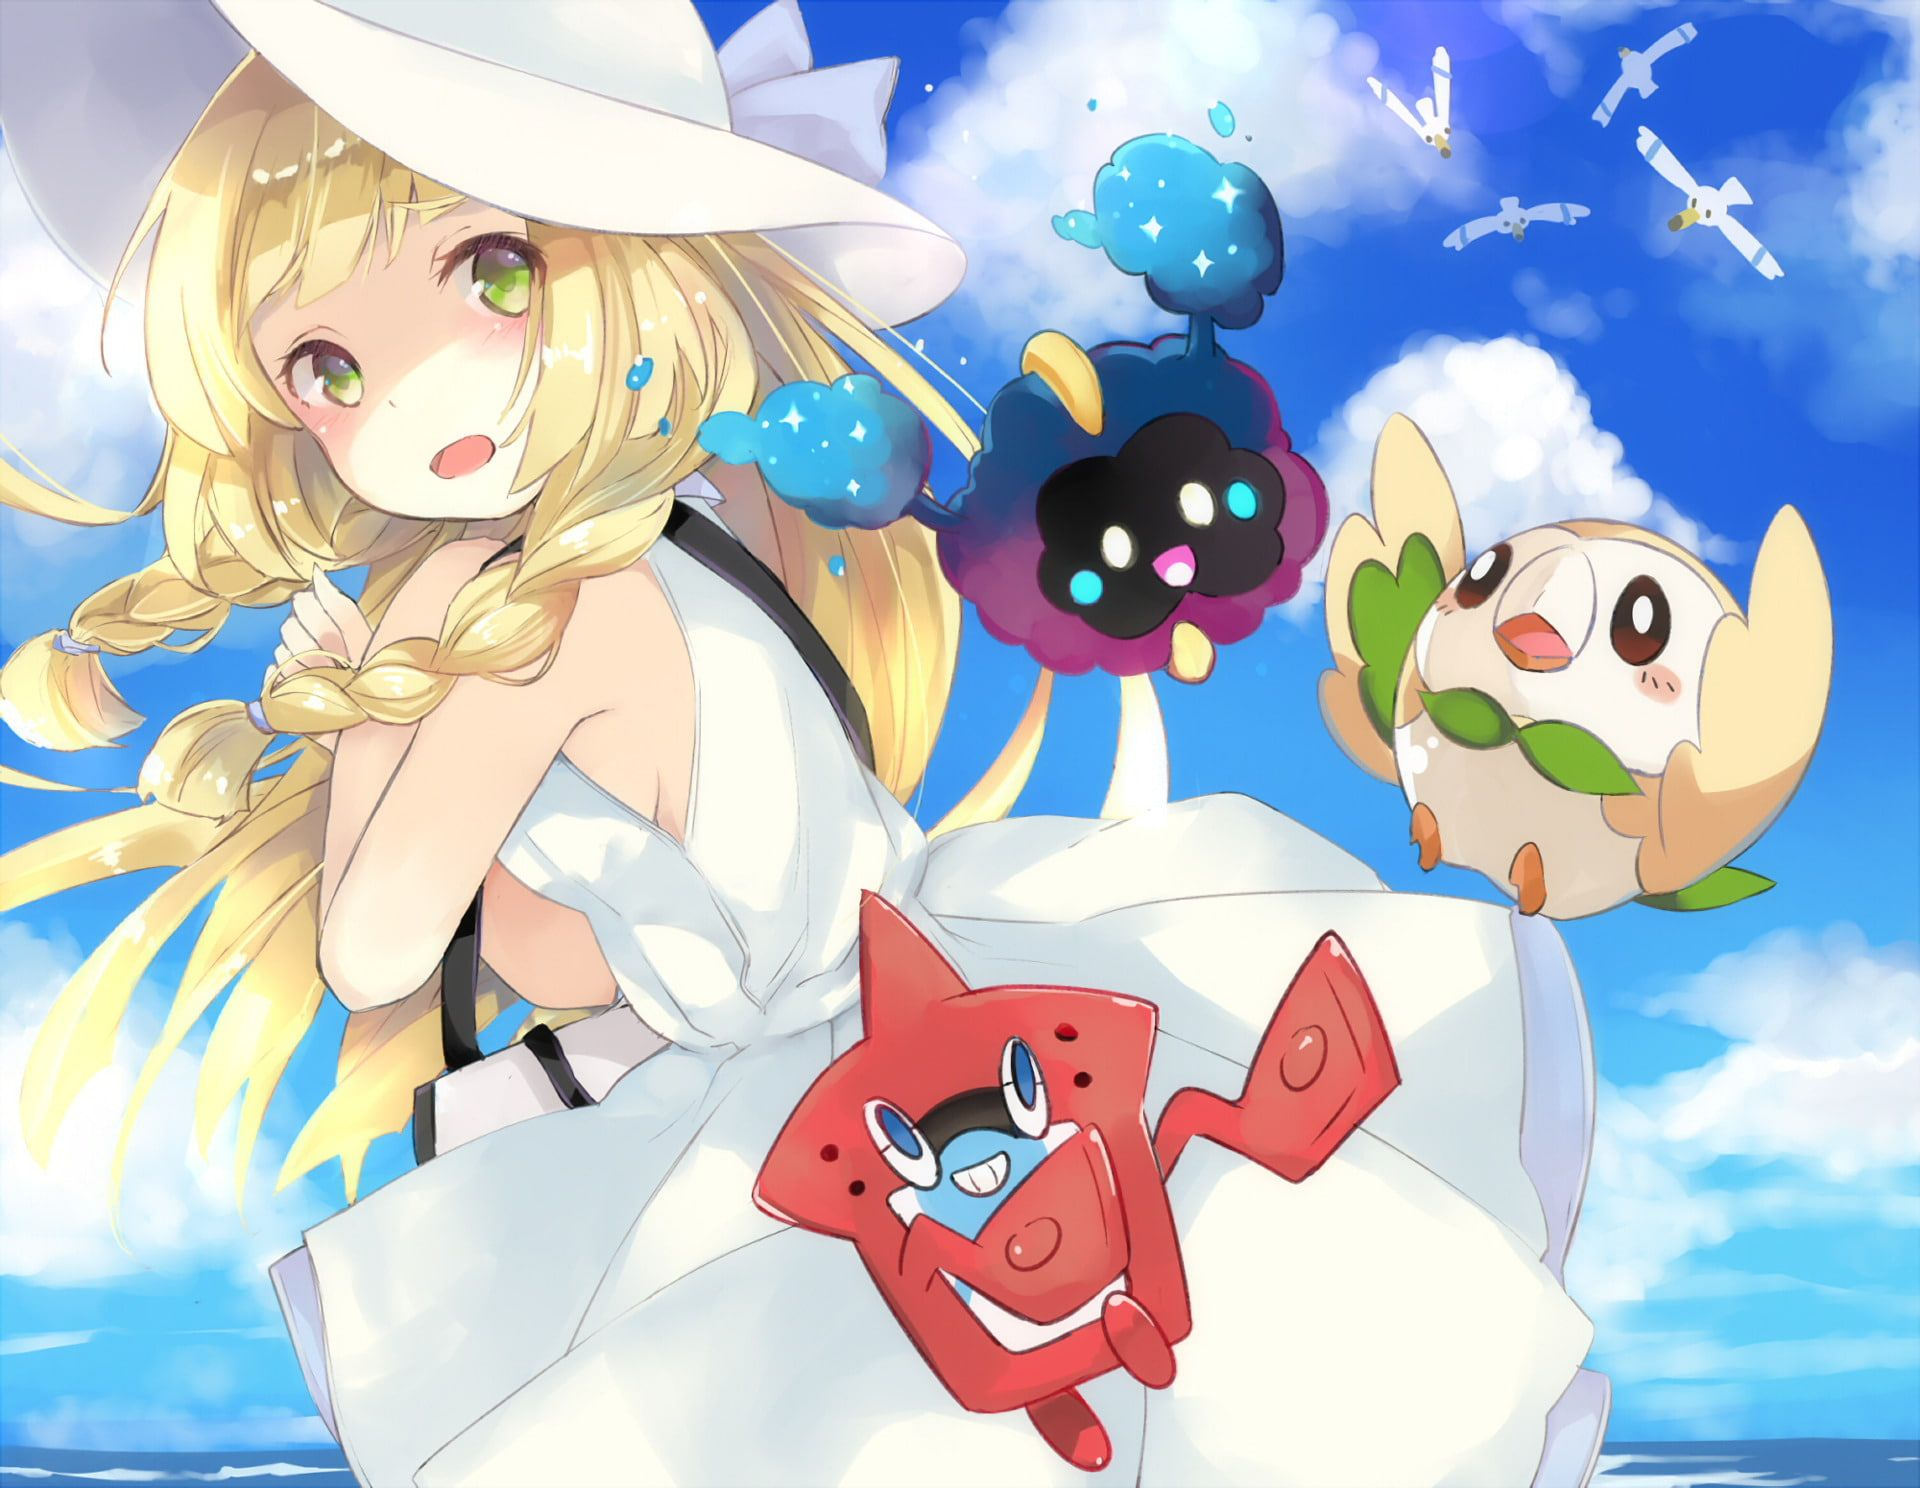 Pokemon Pokemon Sun And Moon Cosmog Pokemon Lillie Pokemon Rotom Pokemon Rowlet Pokemon Wingull Pokemon 1080p Wallpaper Pokemon Anime Pokemon Sun